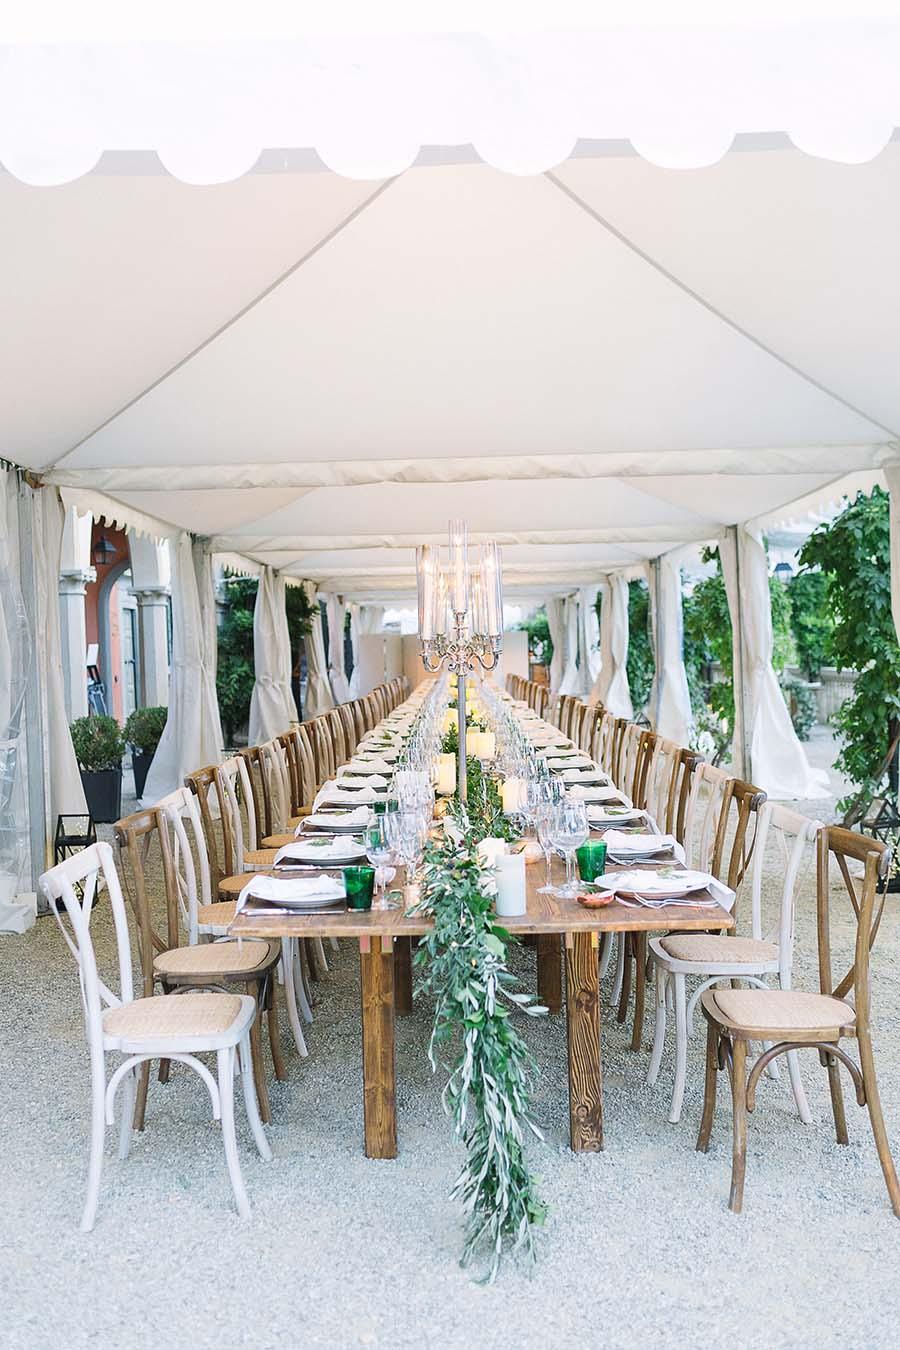 villa-le-fontanelle-wedding-photographer-ilaria-petrucci-marco-severine-678